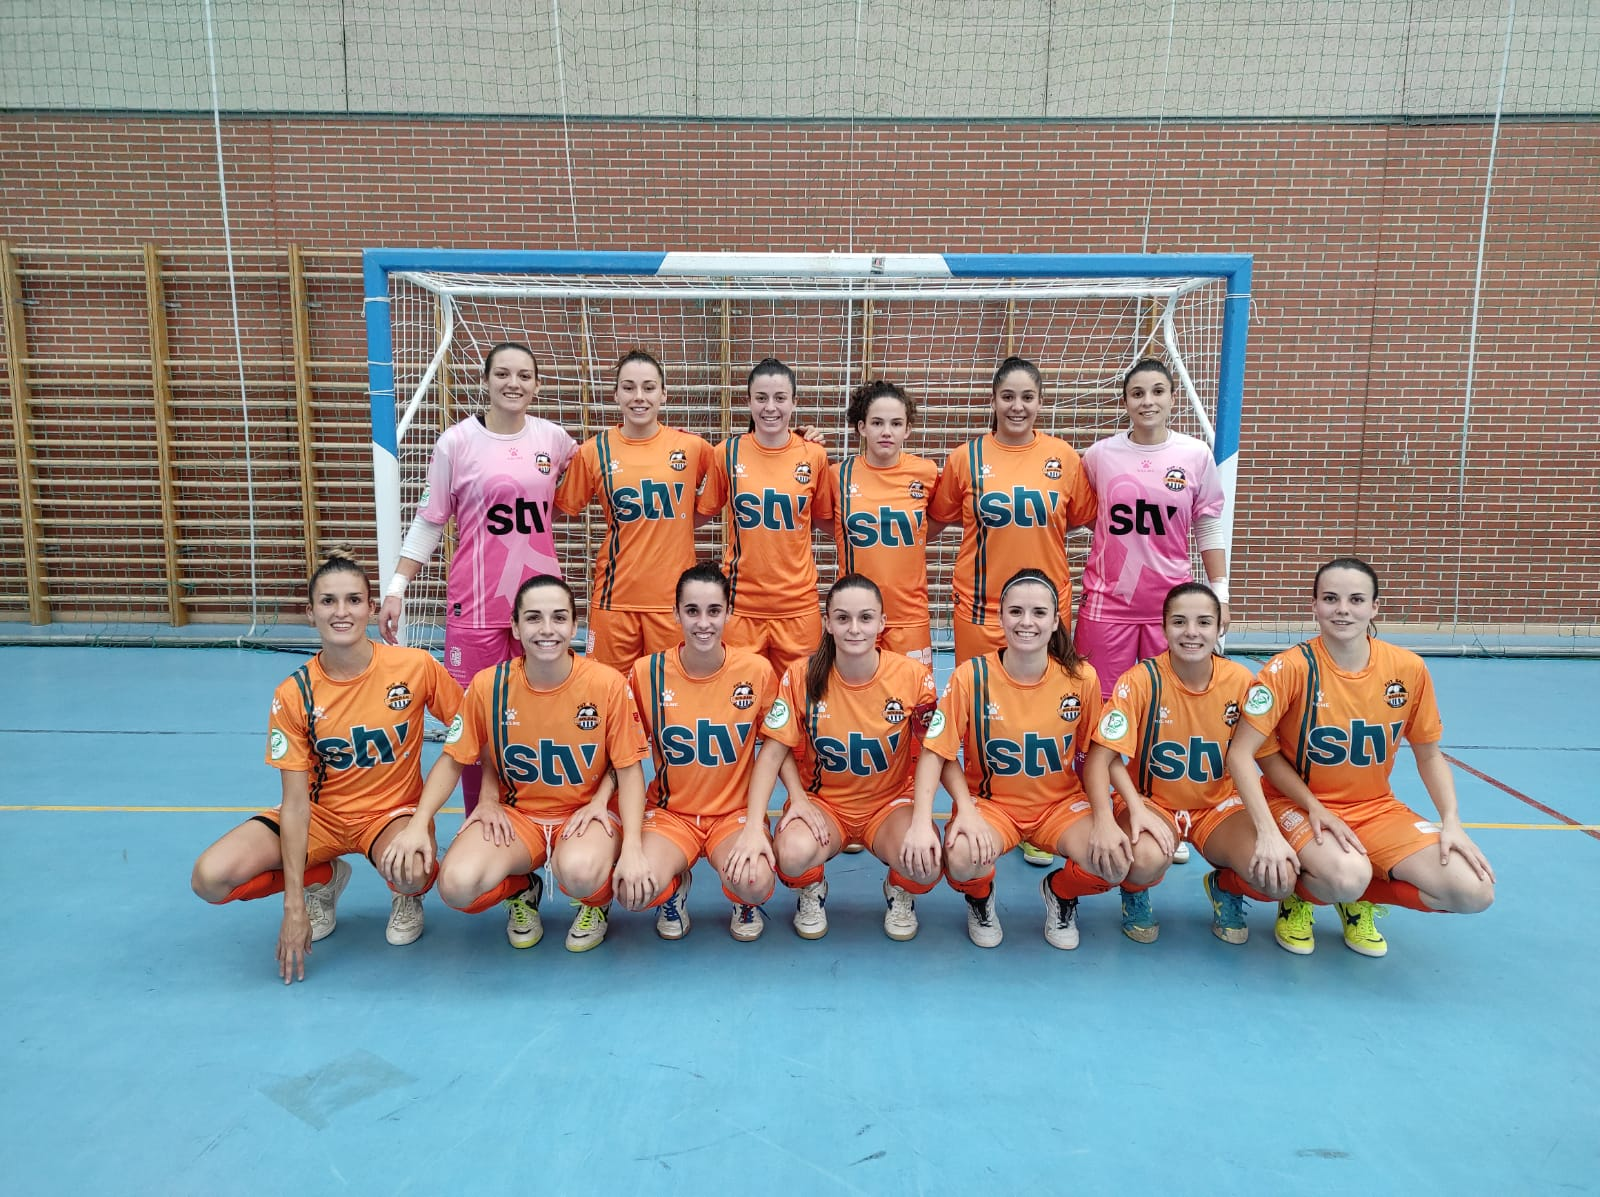 Crónica del Partido de Liga: CD Leganés FS - STV Roldán. Jornada 2ª. 1ª División